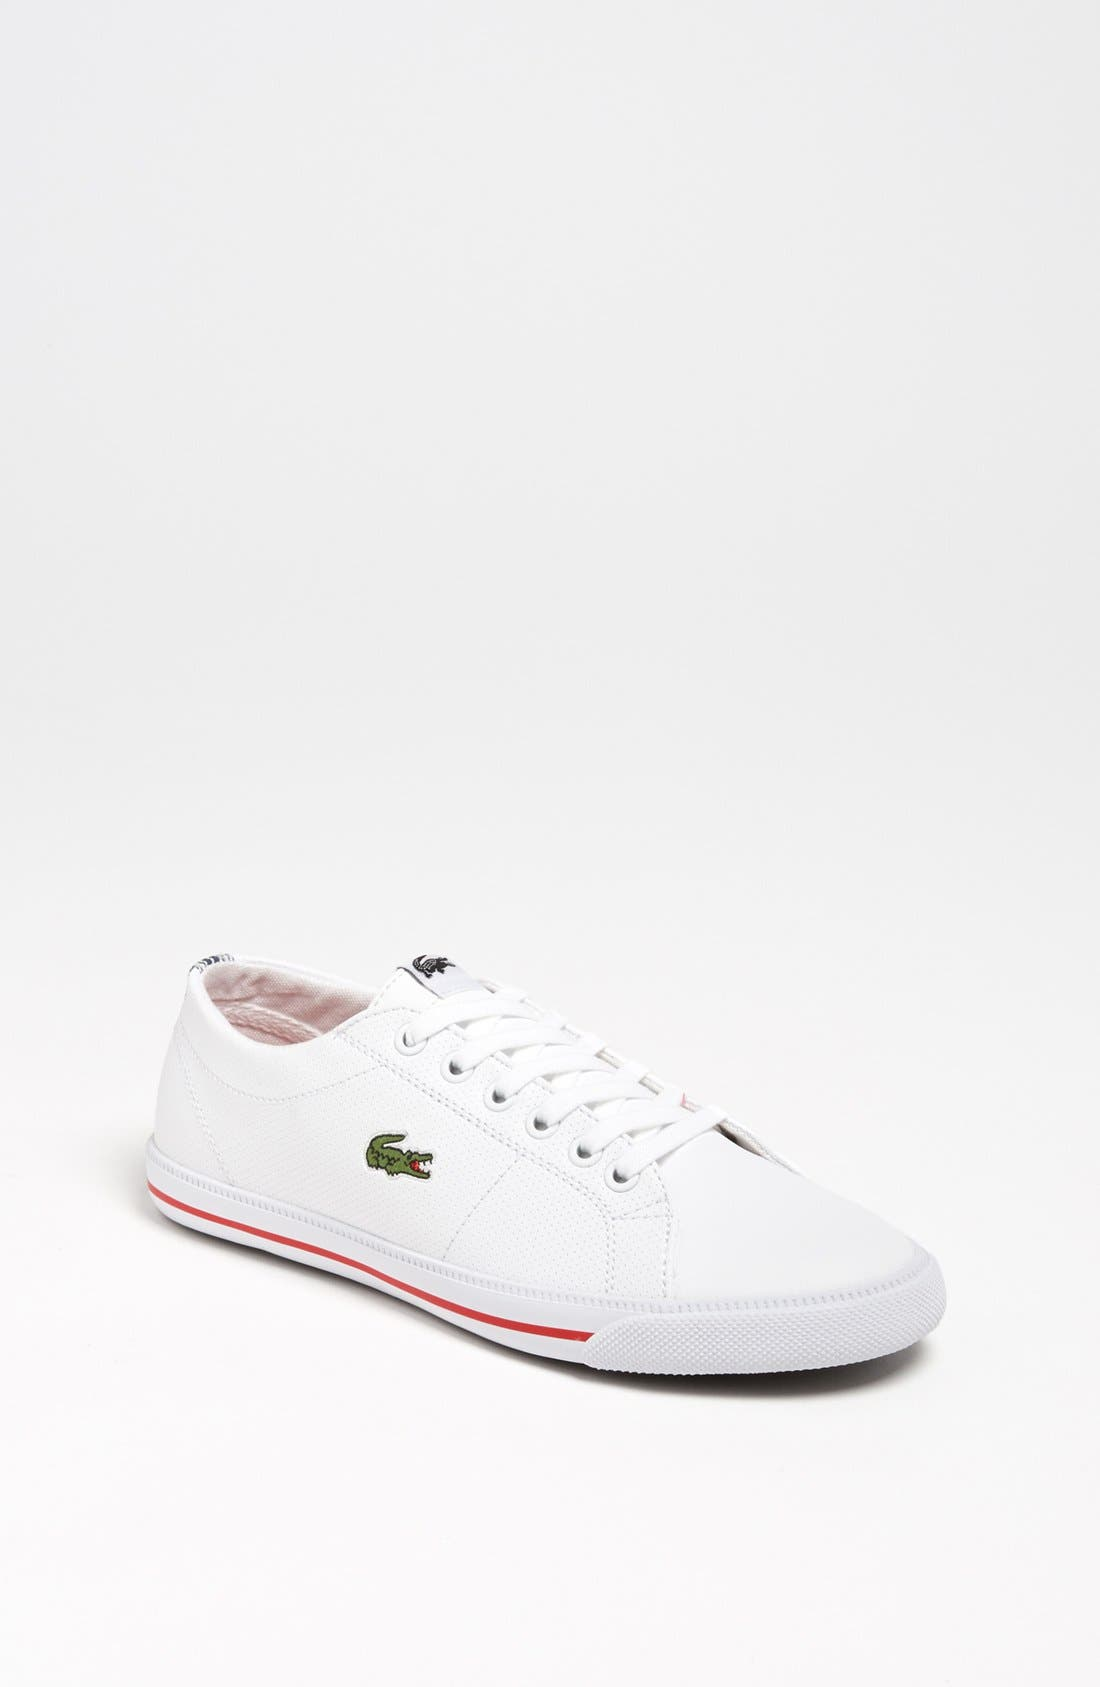 Alternate Image 1 Selected - Lacoste 'Marcel' Sneaker (Little Kid & Big Kid)